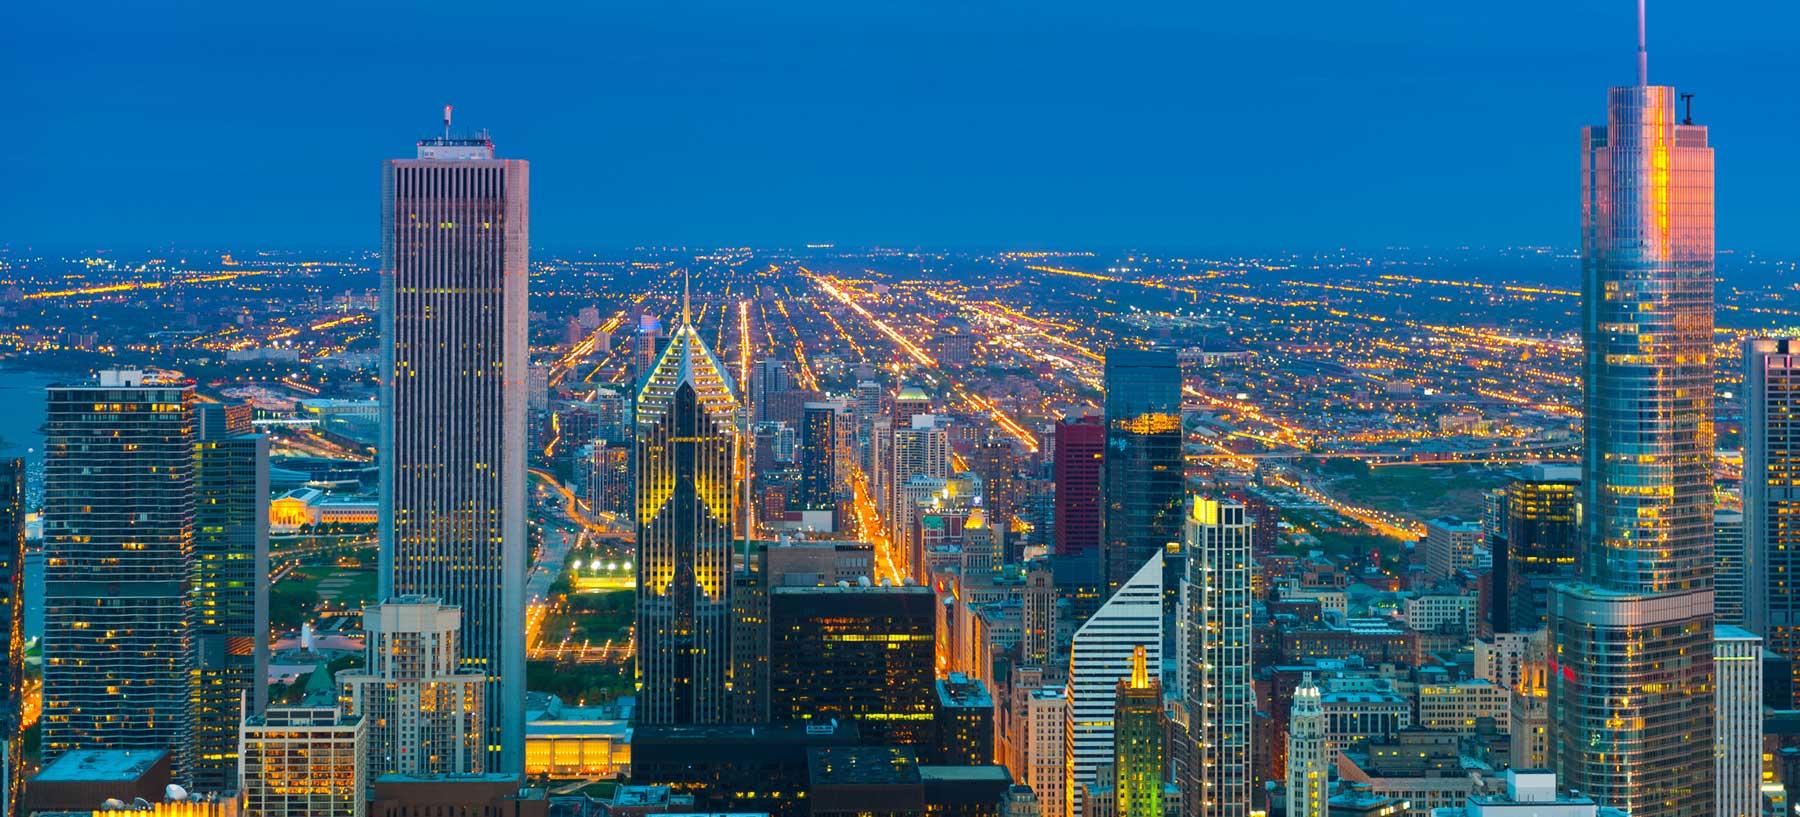 Chicago area and Illinois Commercial Litigation Lawyer Daniel J. Voelker